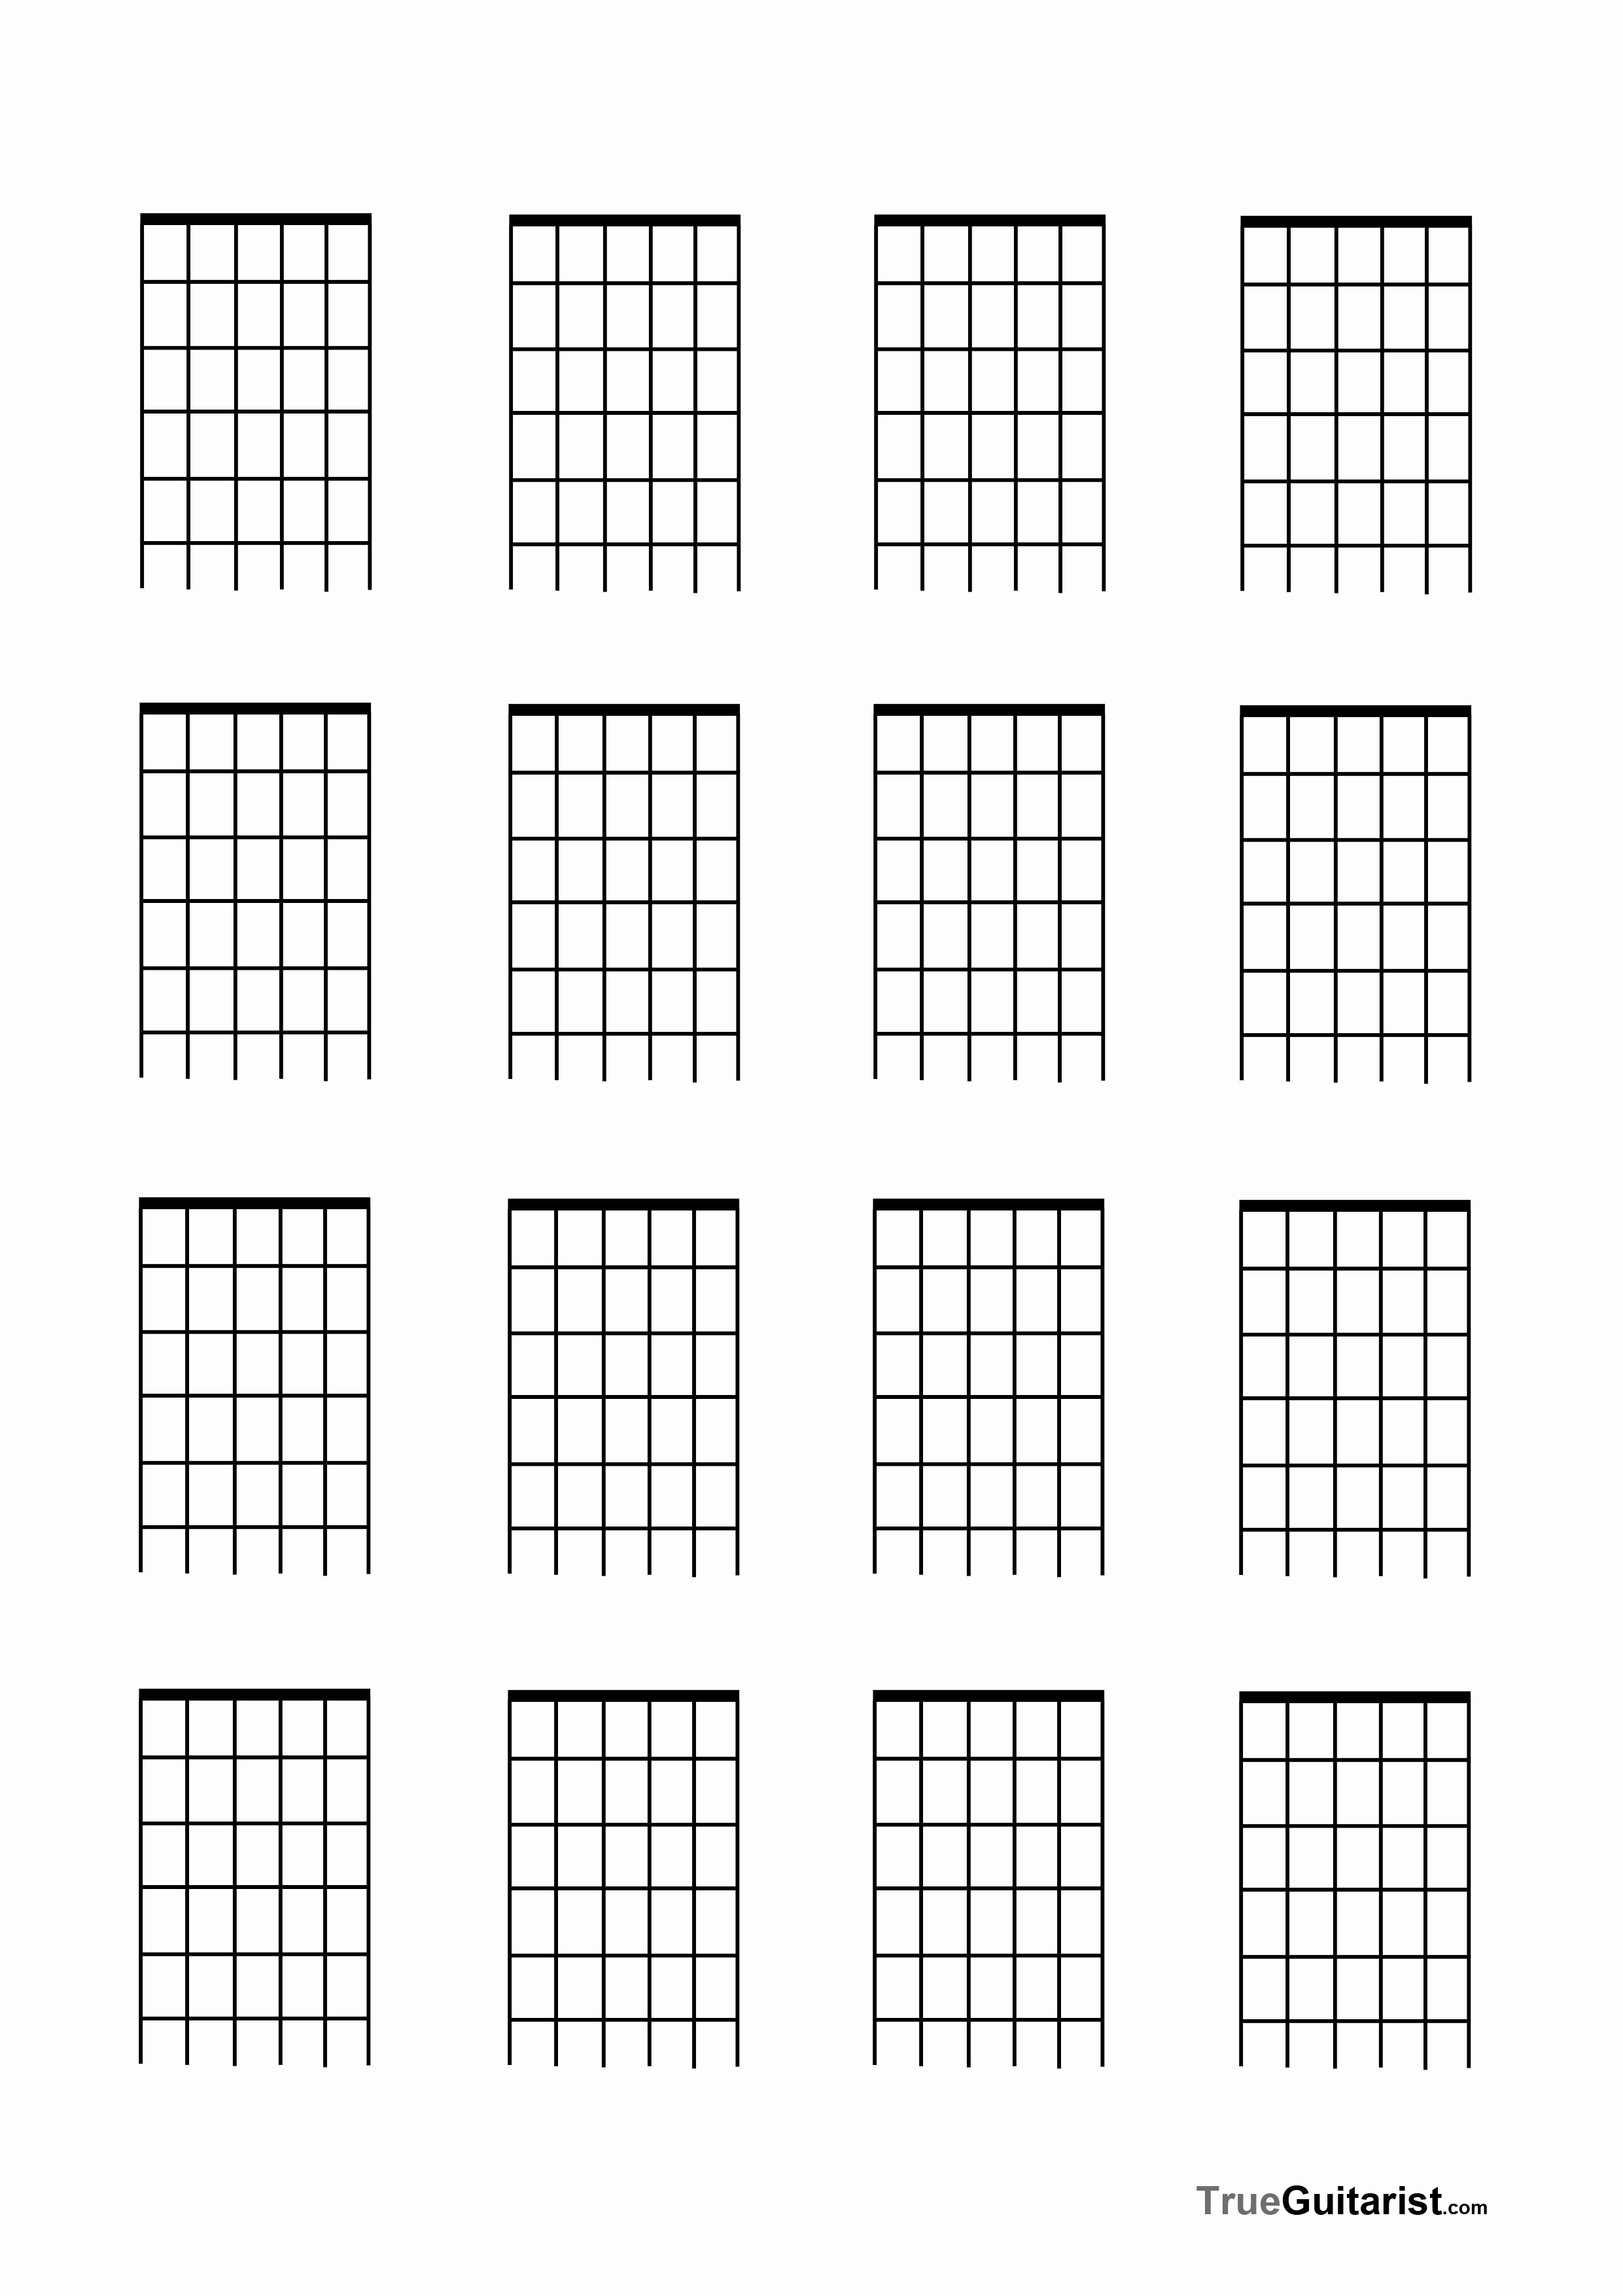 Blank Guitar Tab Pdf Awesome Blank Chord Chart Pdf